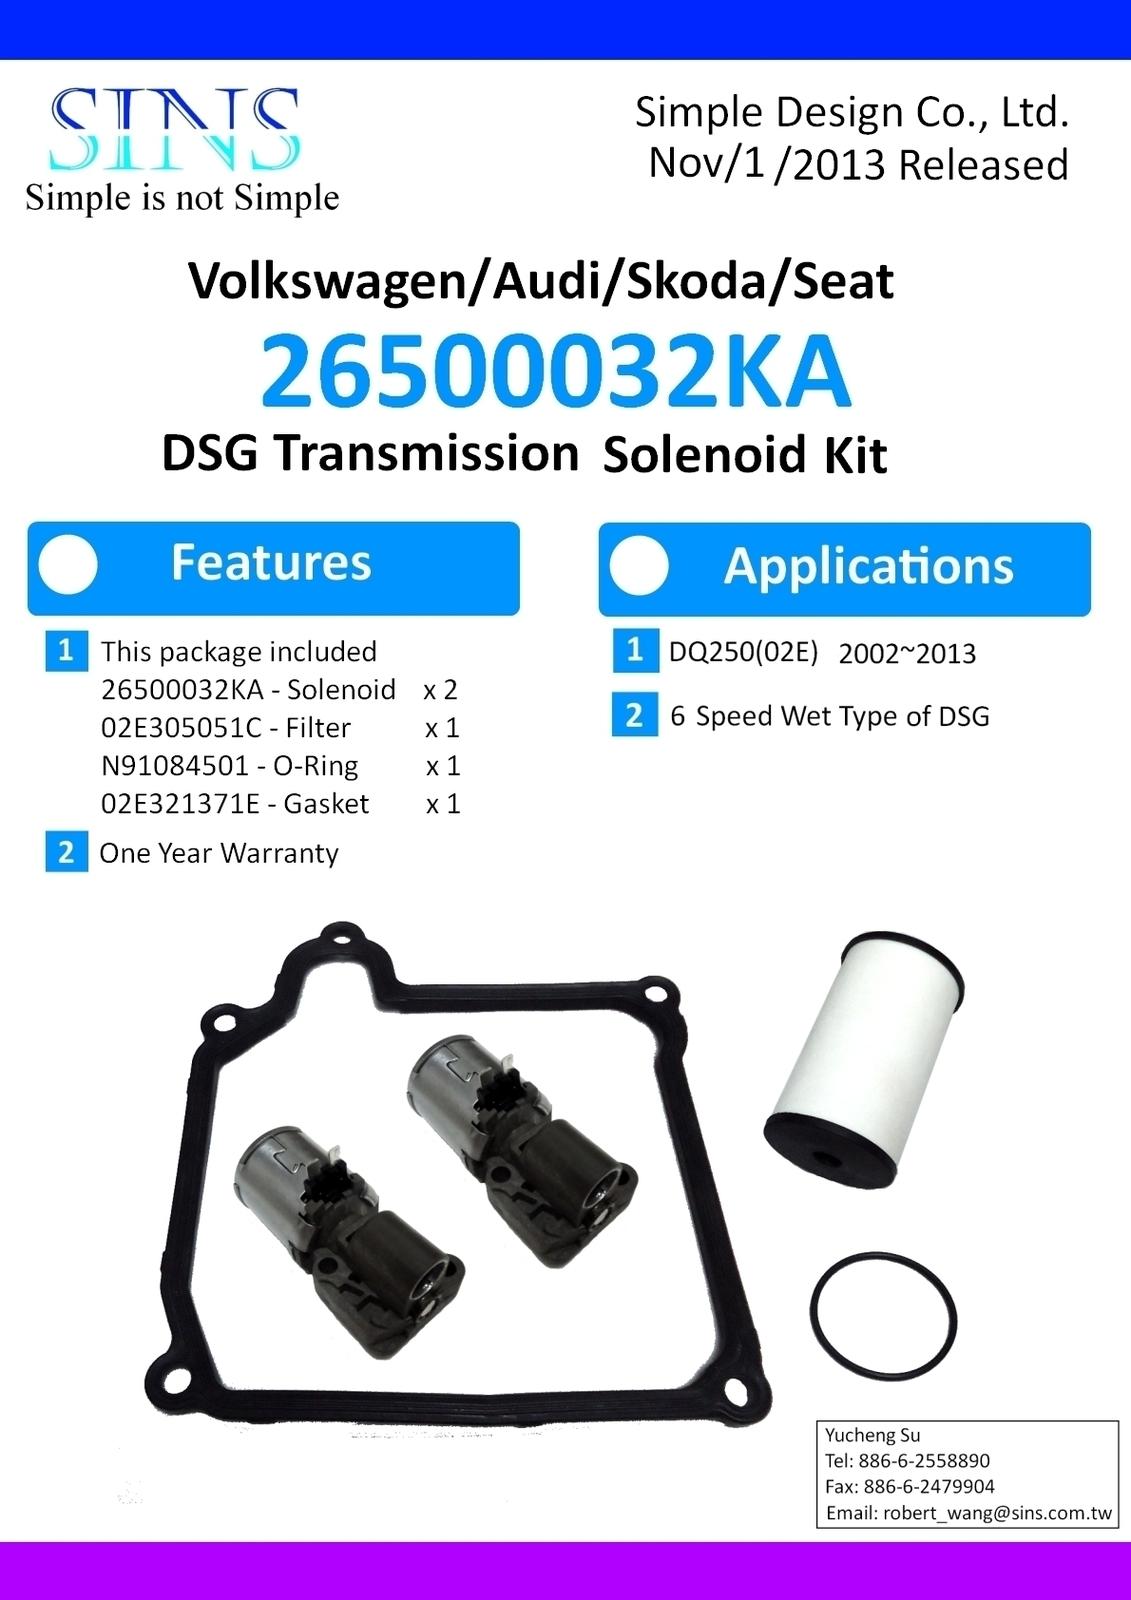 VW/Audi/Skoda/Seat DQ250 DSG Transmission Solenoid Kit-N215 N216, Filter, Gasket image 5